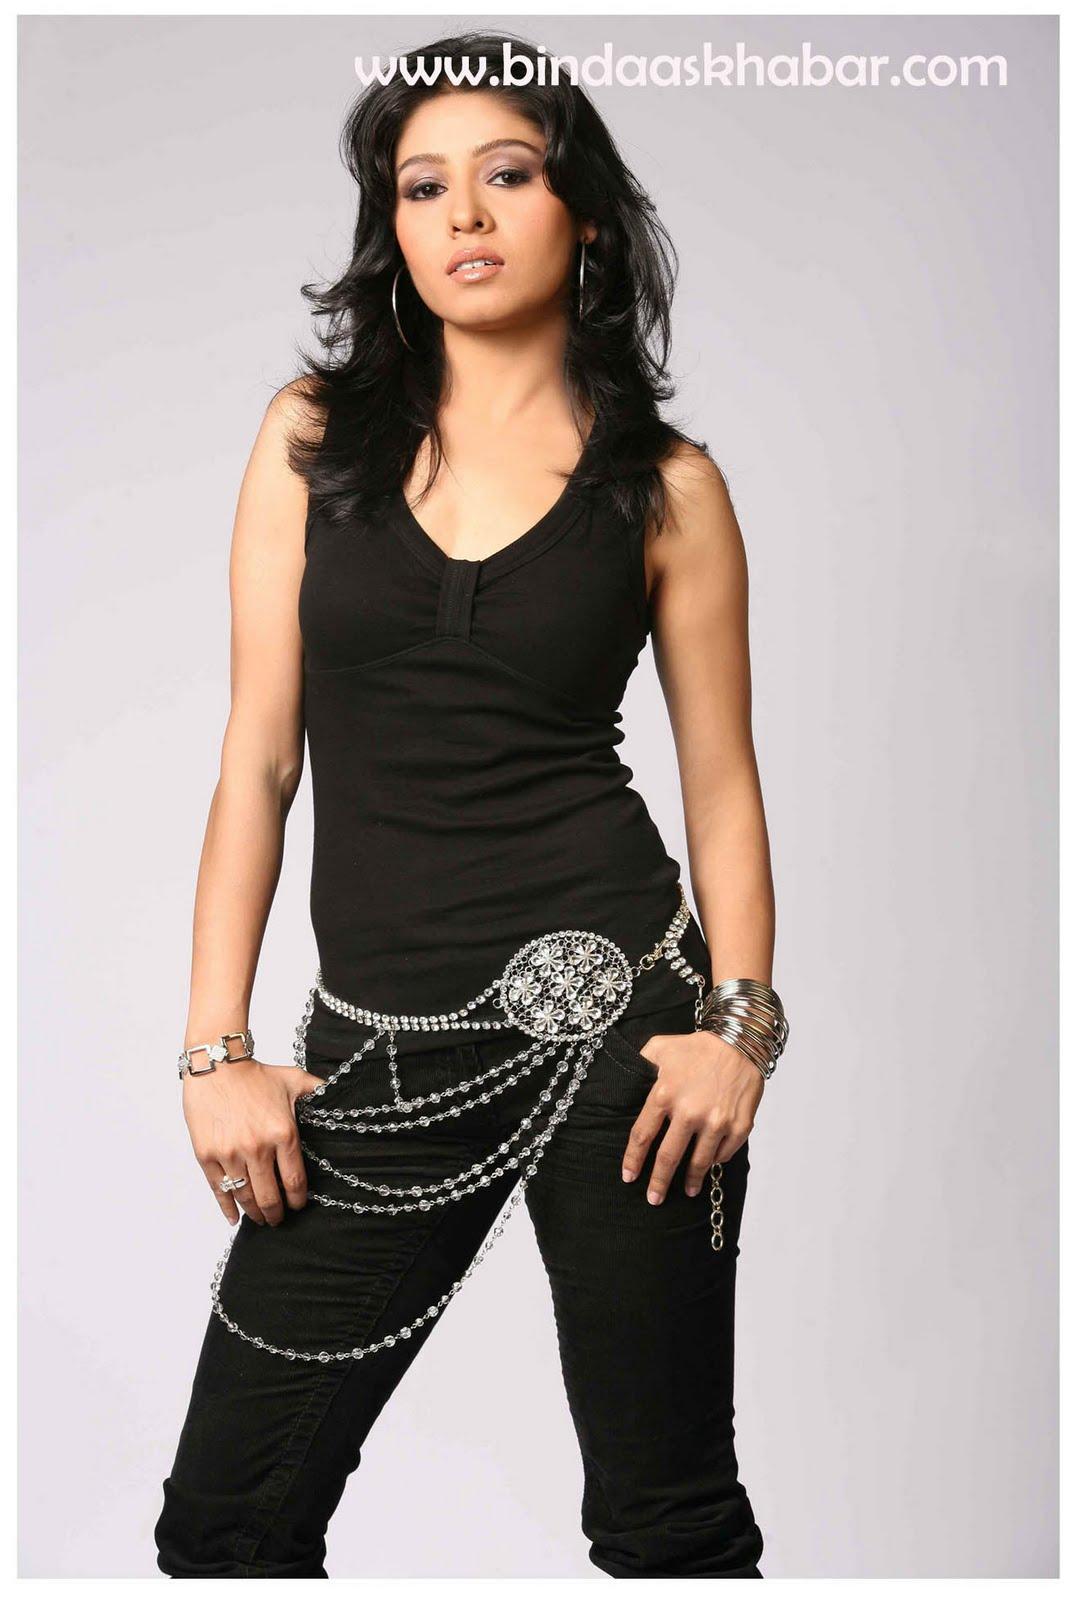 Zoya Nidhi Bindaas_snaps: Sunidhi...